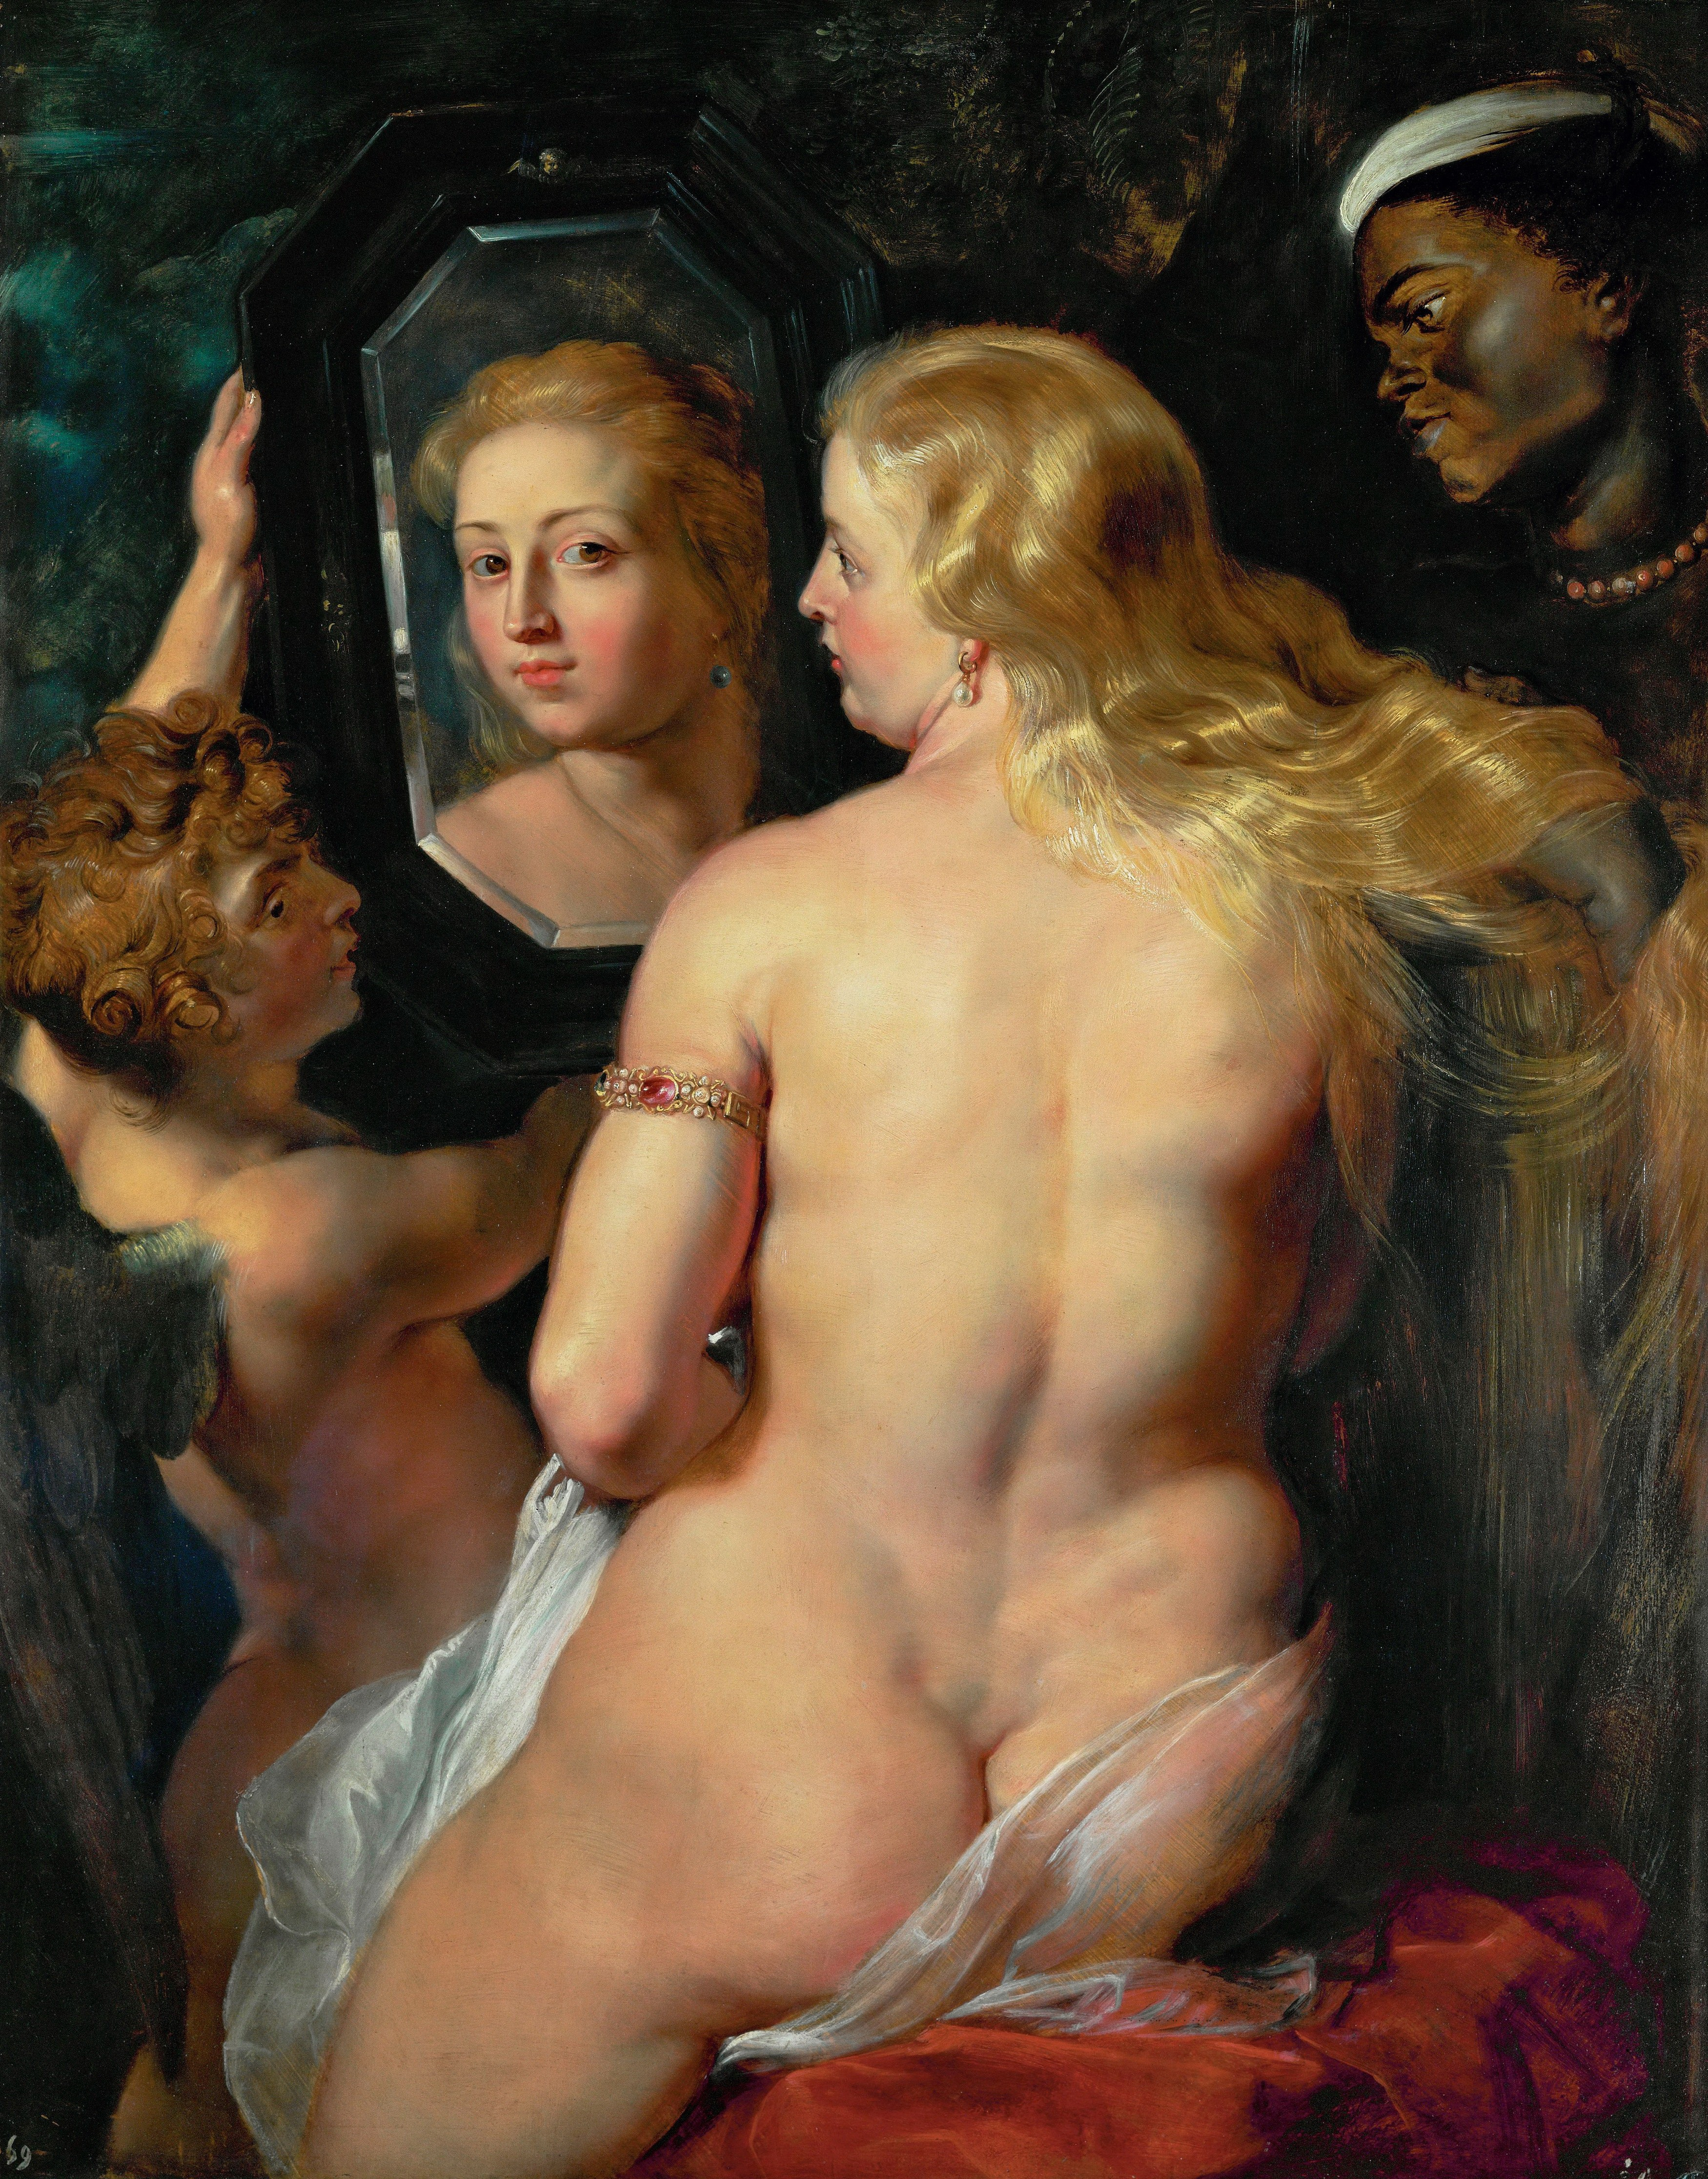 Peter Paul Rubens, 1577-1640. Венера перед зеркалом. 1615. 24 х 98 см. Вена, Музей Лихтенштейн